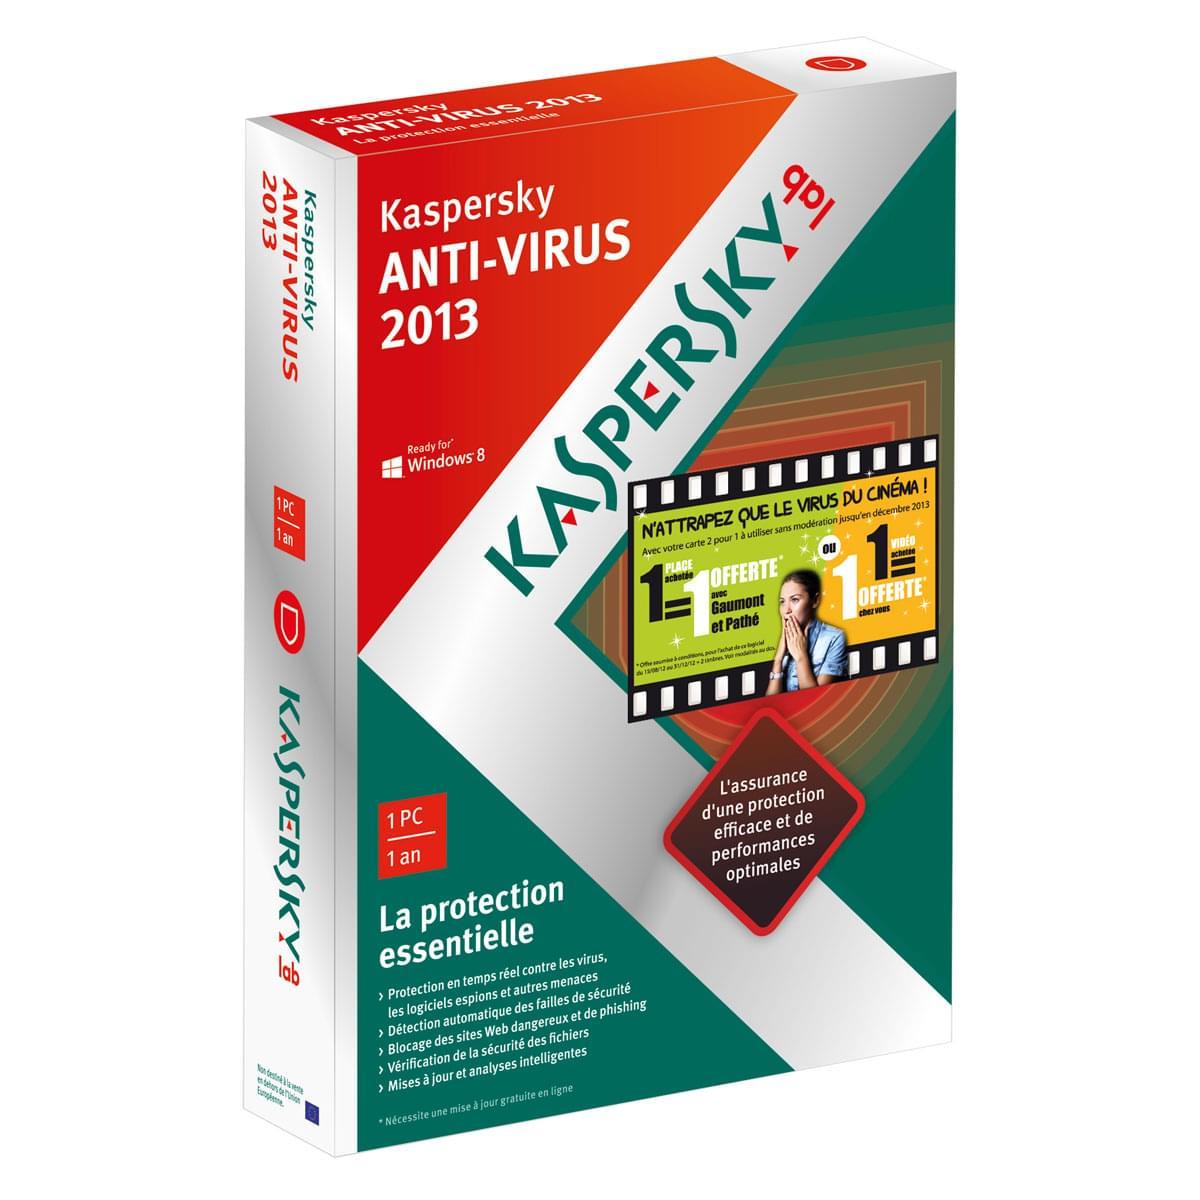 Kaspersky  Anti-Virus 2013 Boite - 1 poste / 1 An - Logiciel sécurité - 0